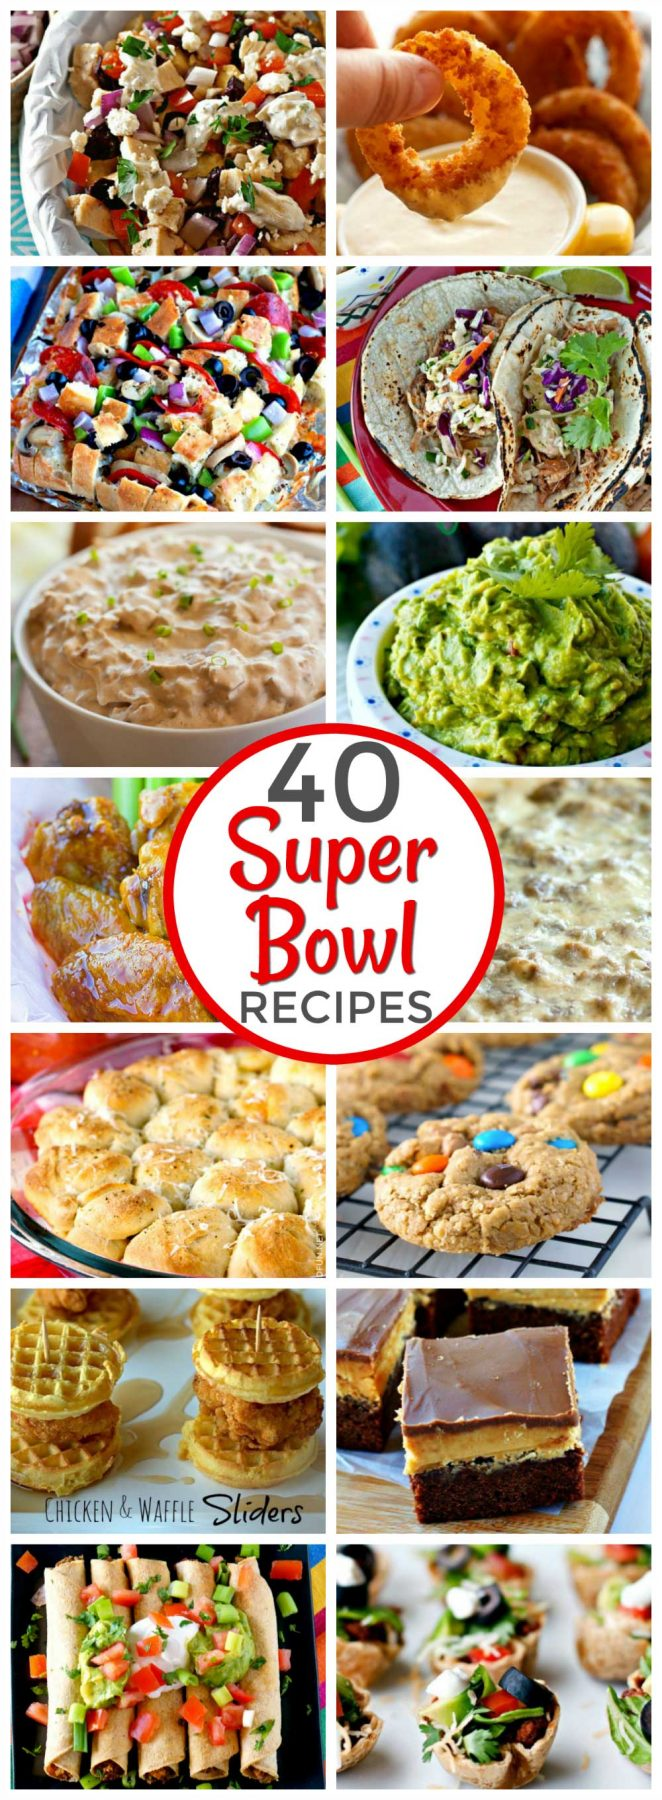 Super Bowl food recipes for Super Bowl Sunday